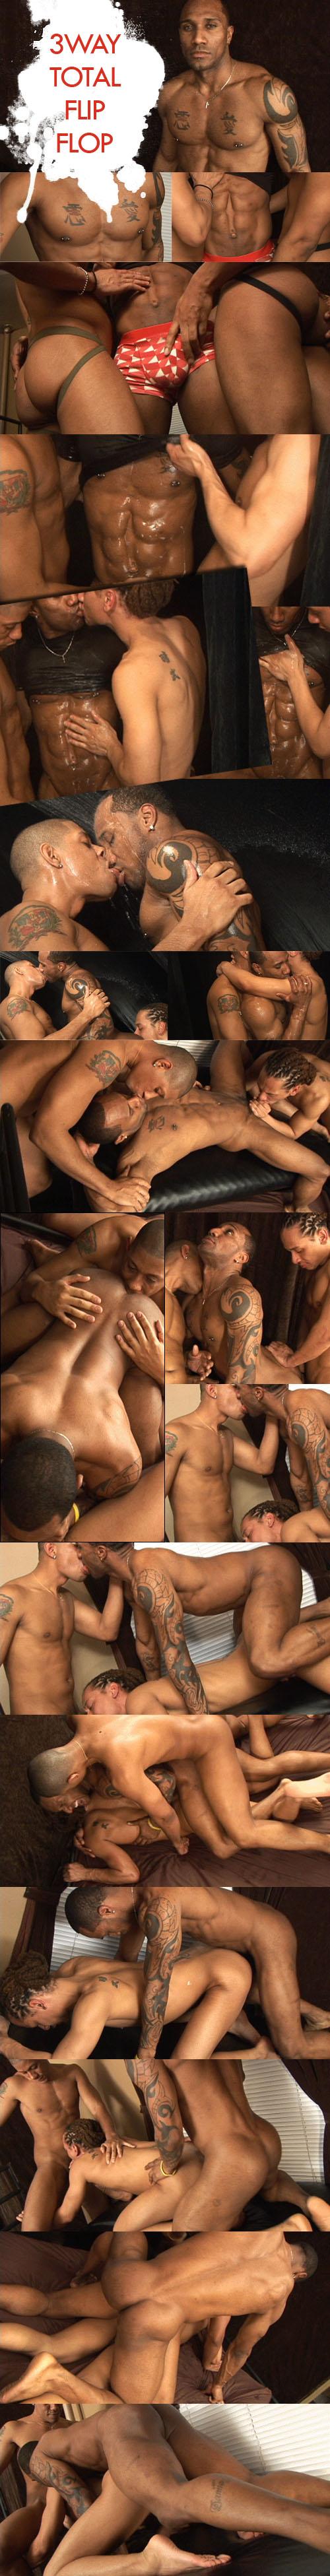 PapiThugz Threesome